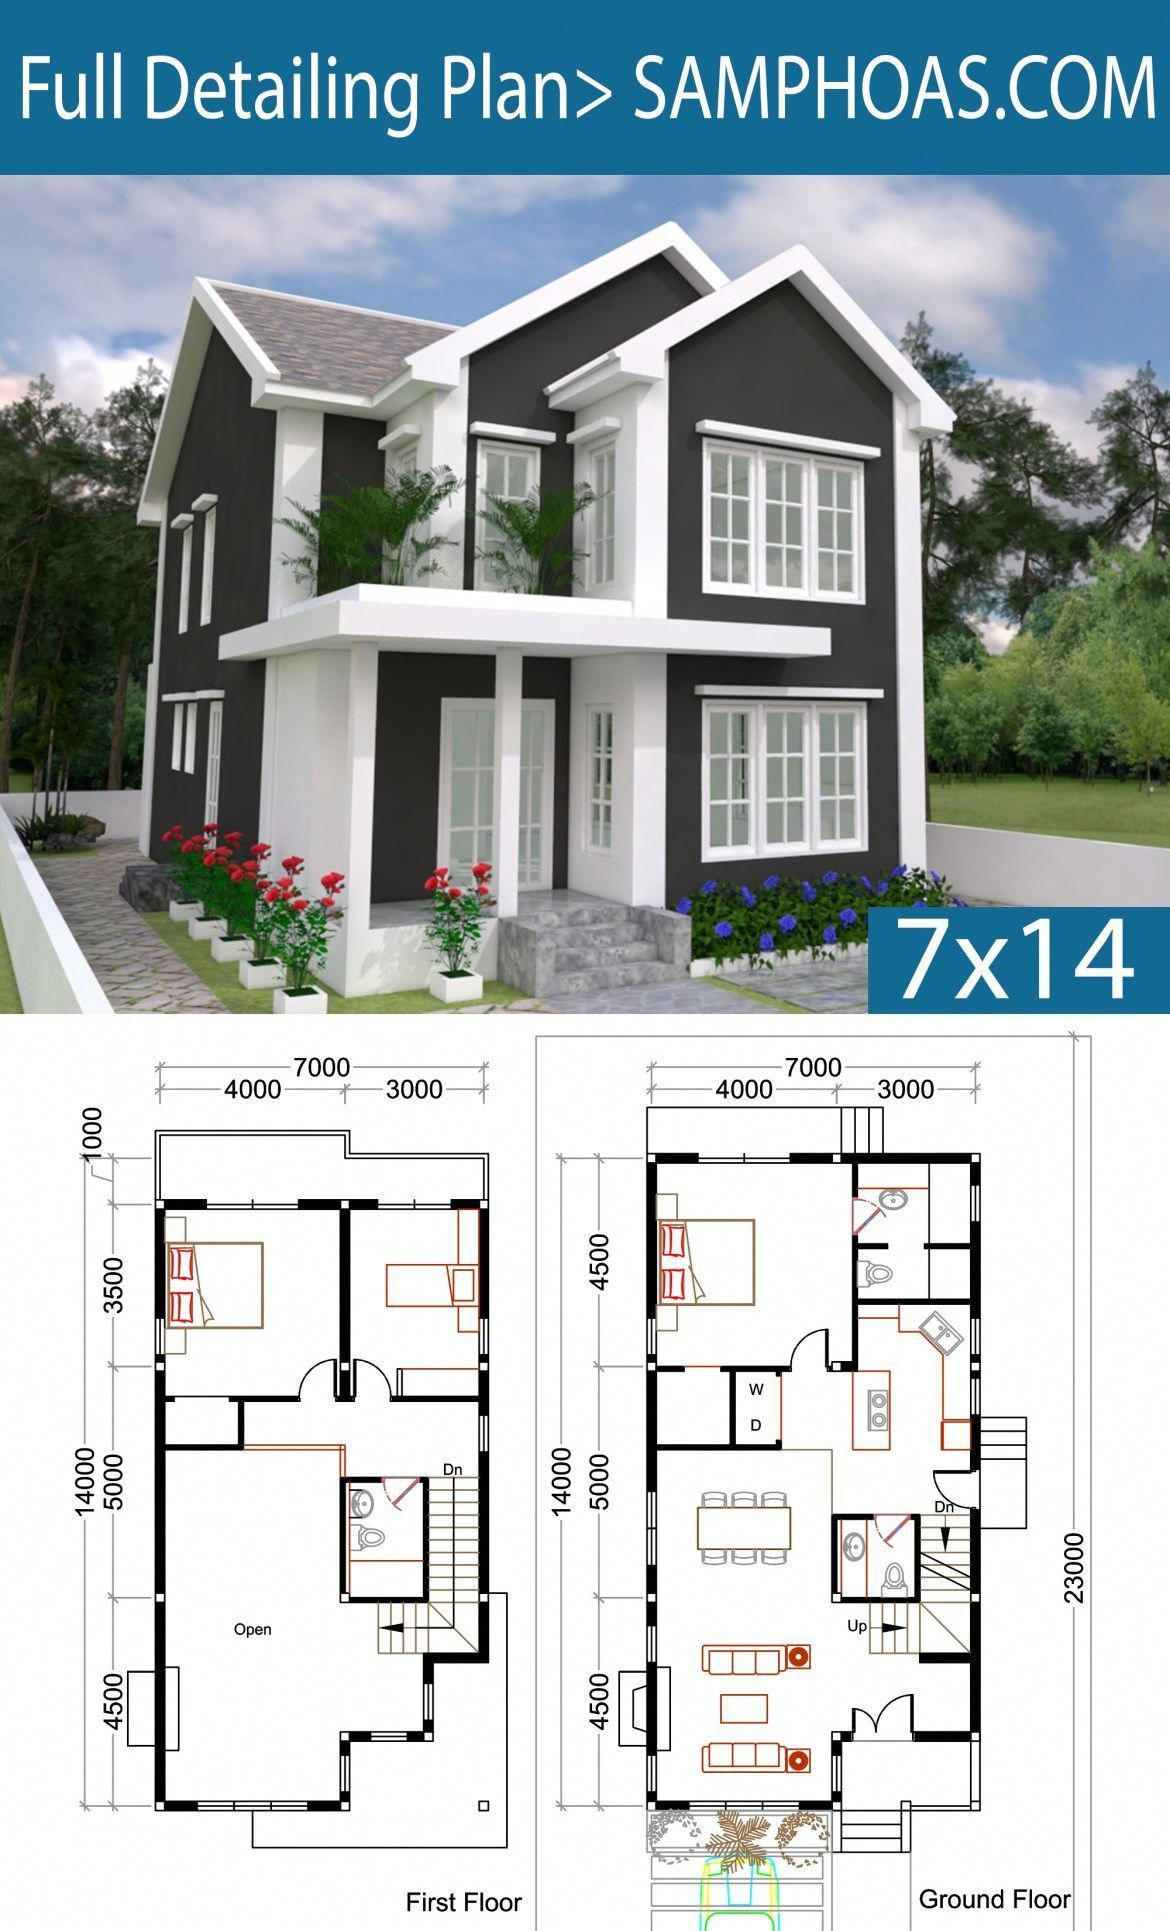 Building Remodeling Home Renovation Sites Home Improvement Wholesale 20190425 House Plans Sims House Design Sims House Plans